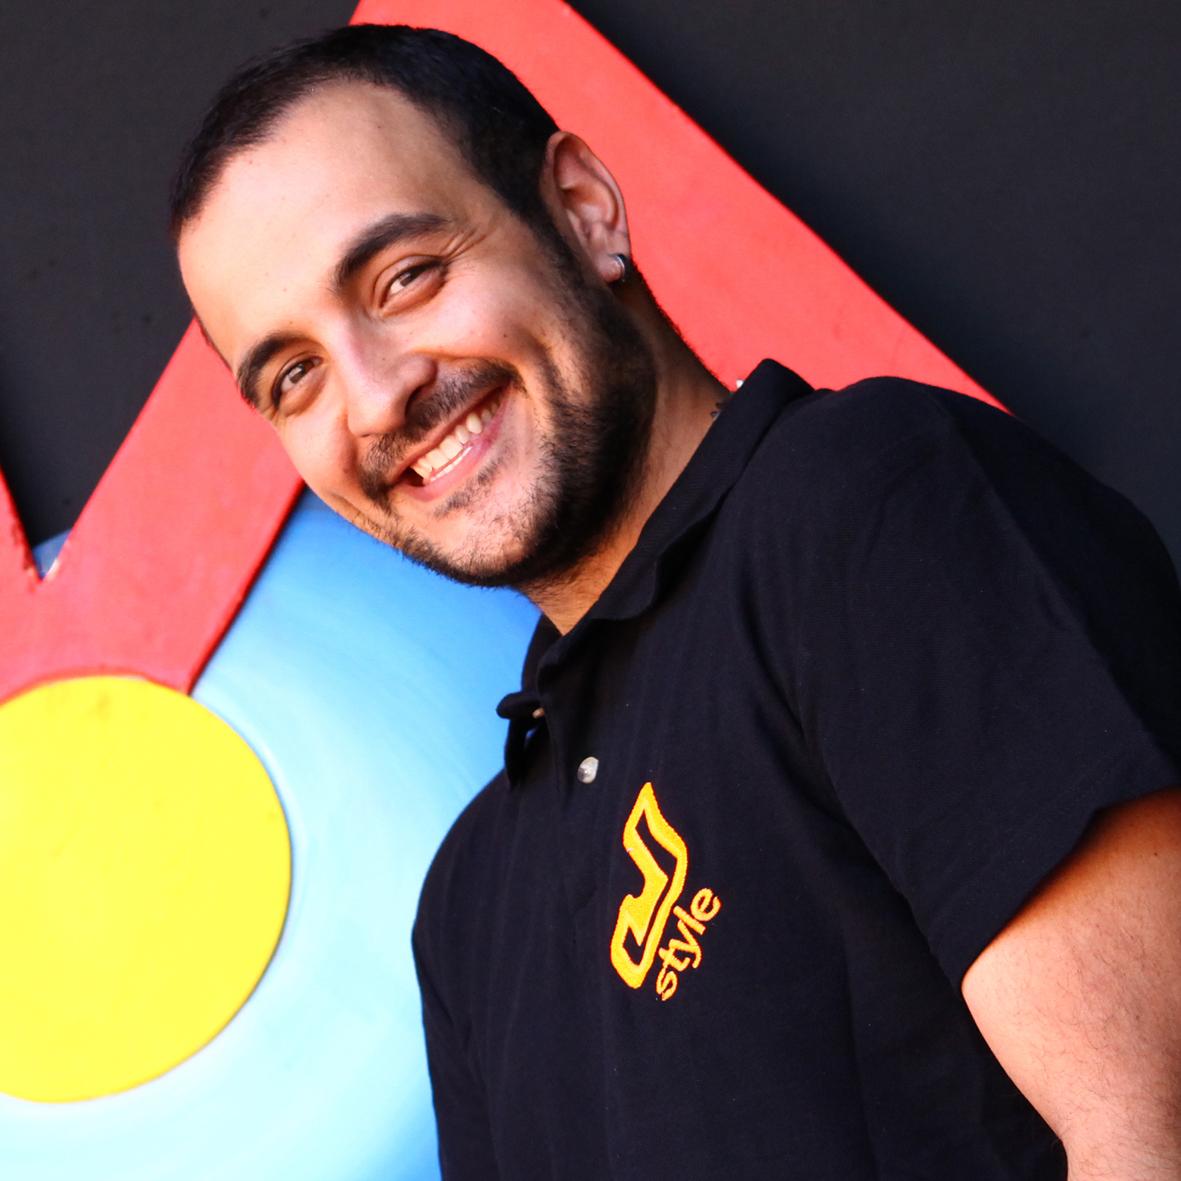 Manuel Mascolo